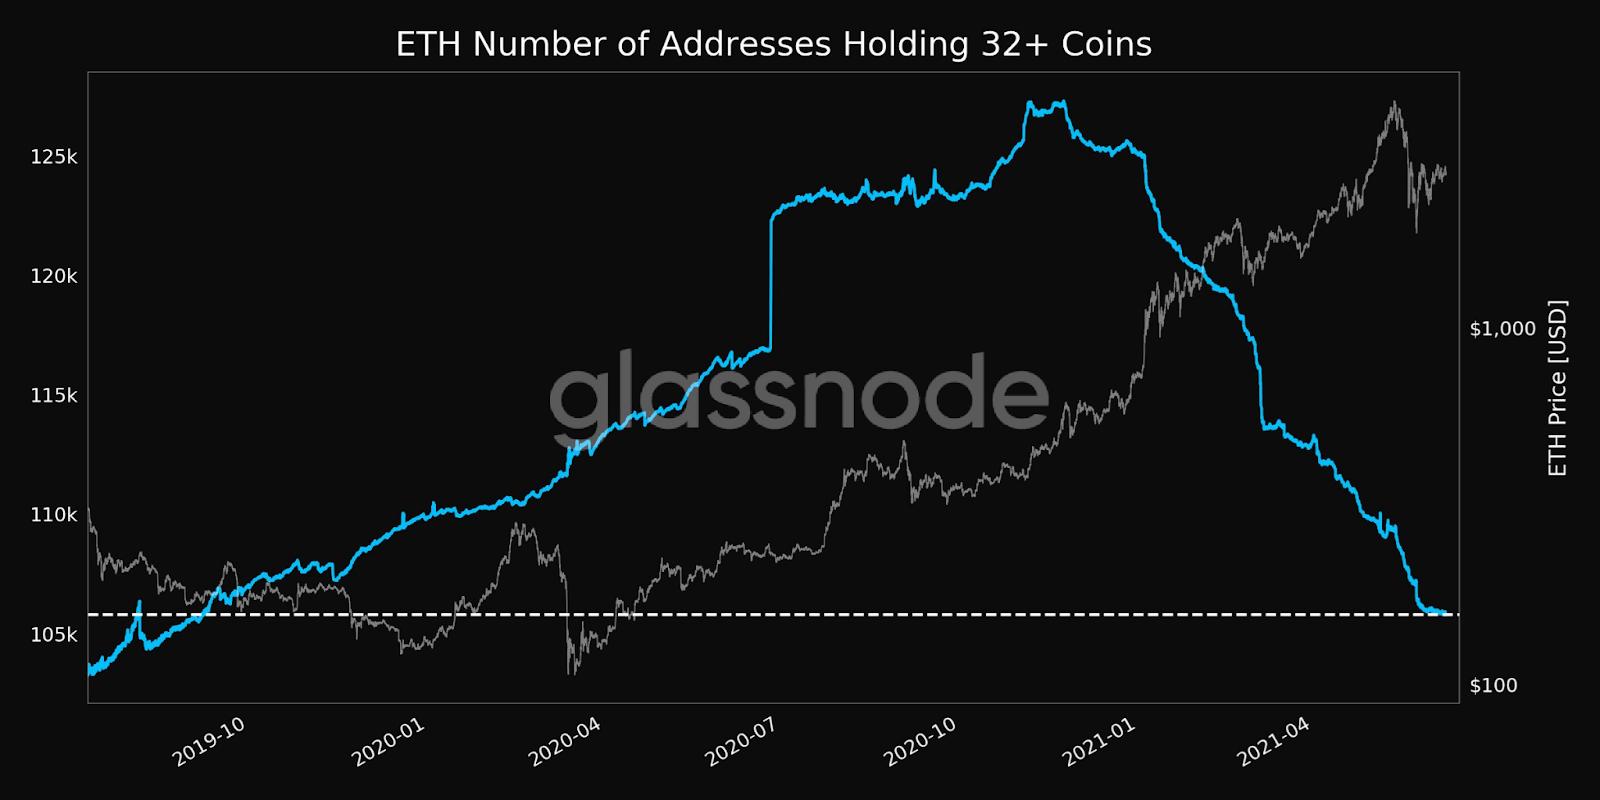 Ethereum ETH 32+ Holding Addresses